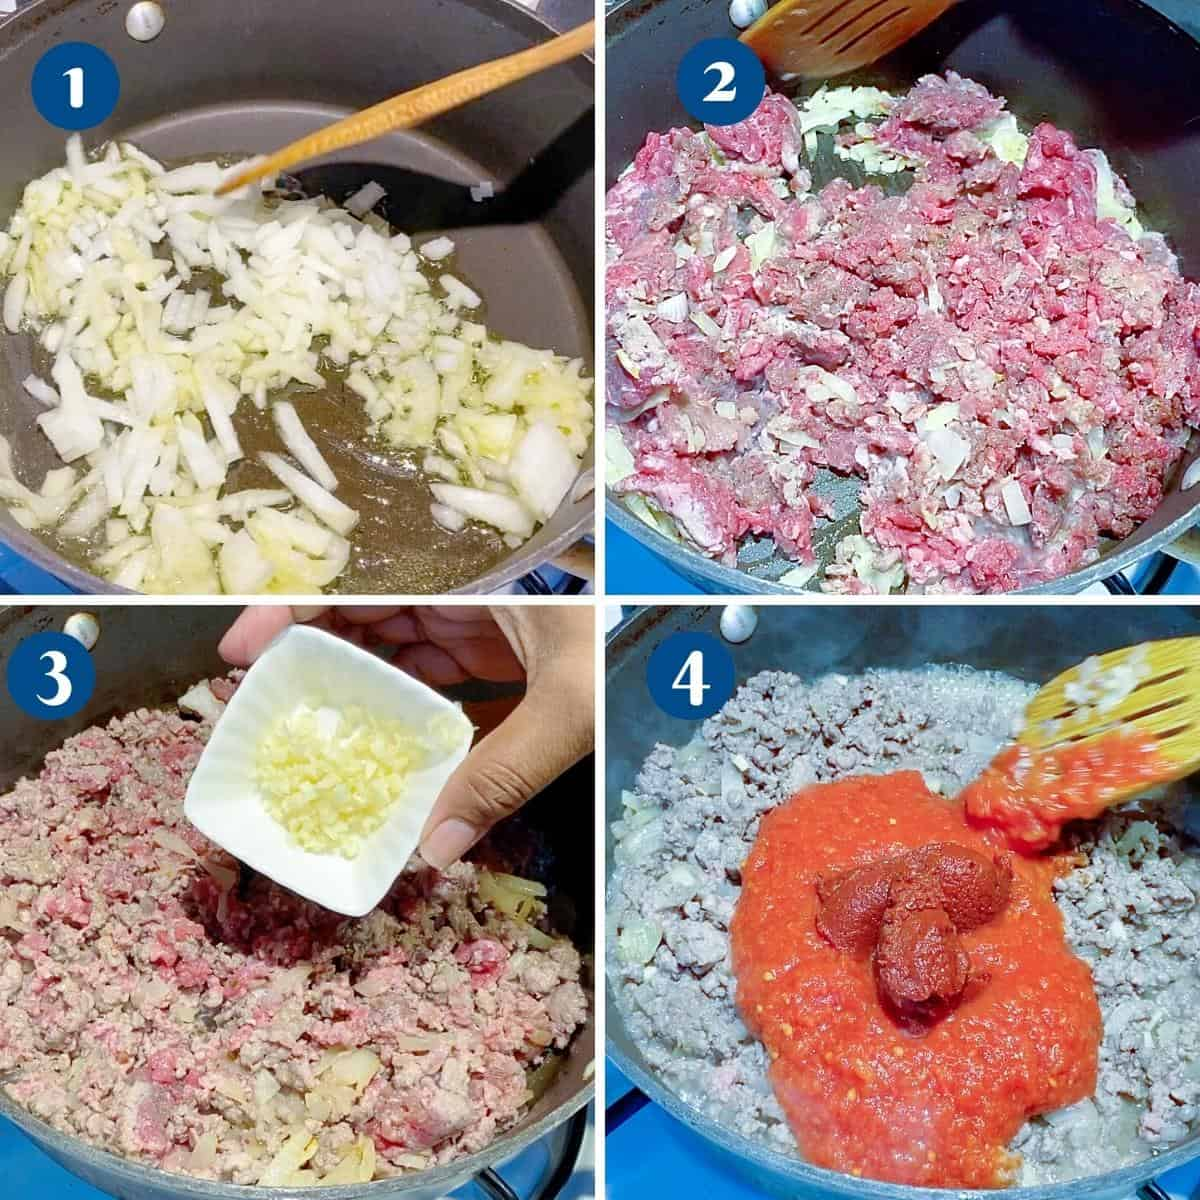 Progress pictures collage sautéing ground beef.